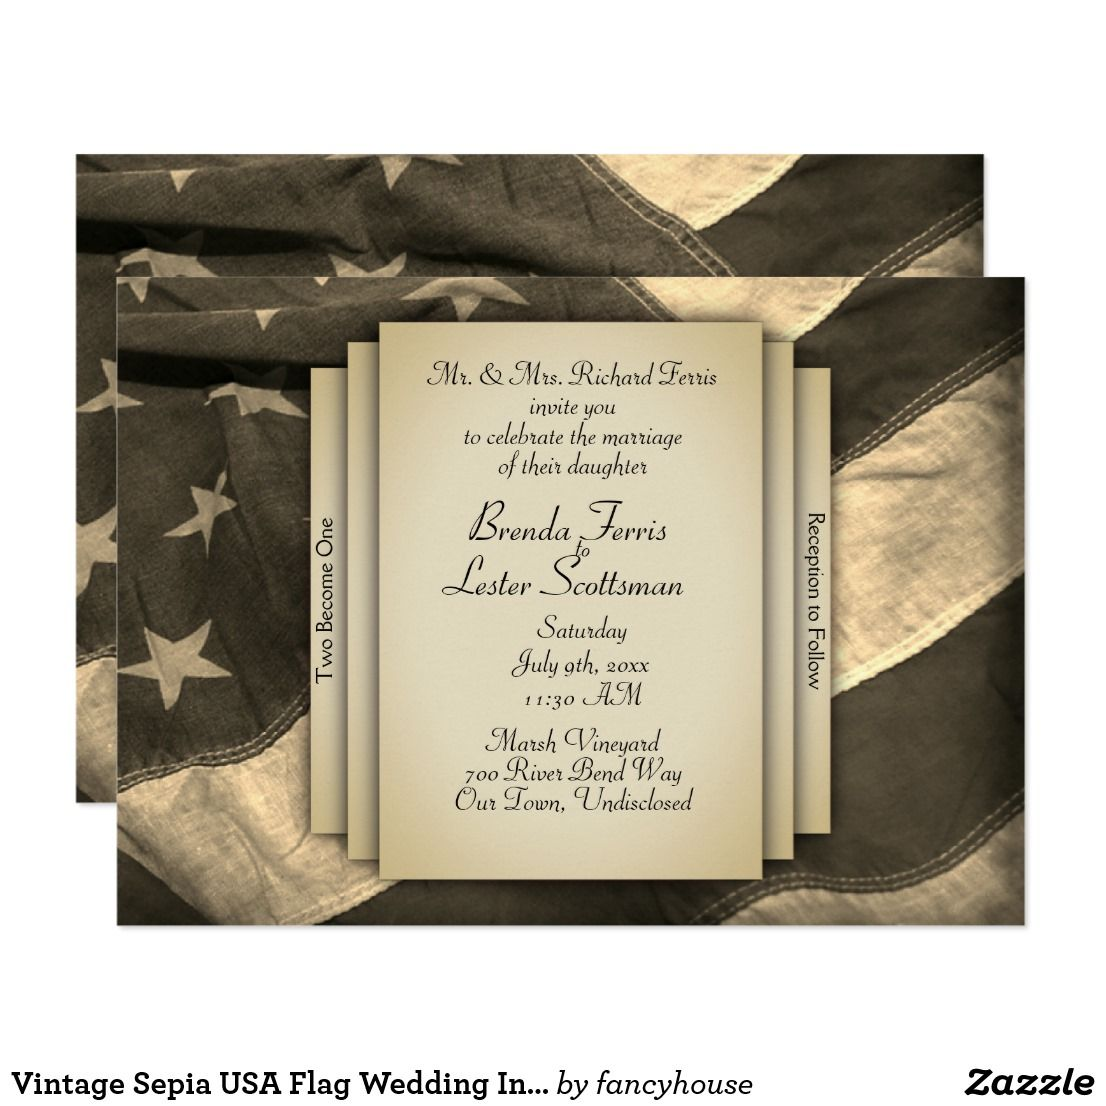 Vintage Sepia USA Flag Wedding Invitation | Usa flag, Bridal gowns ...